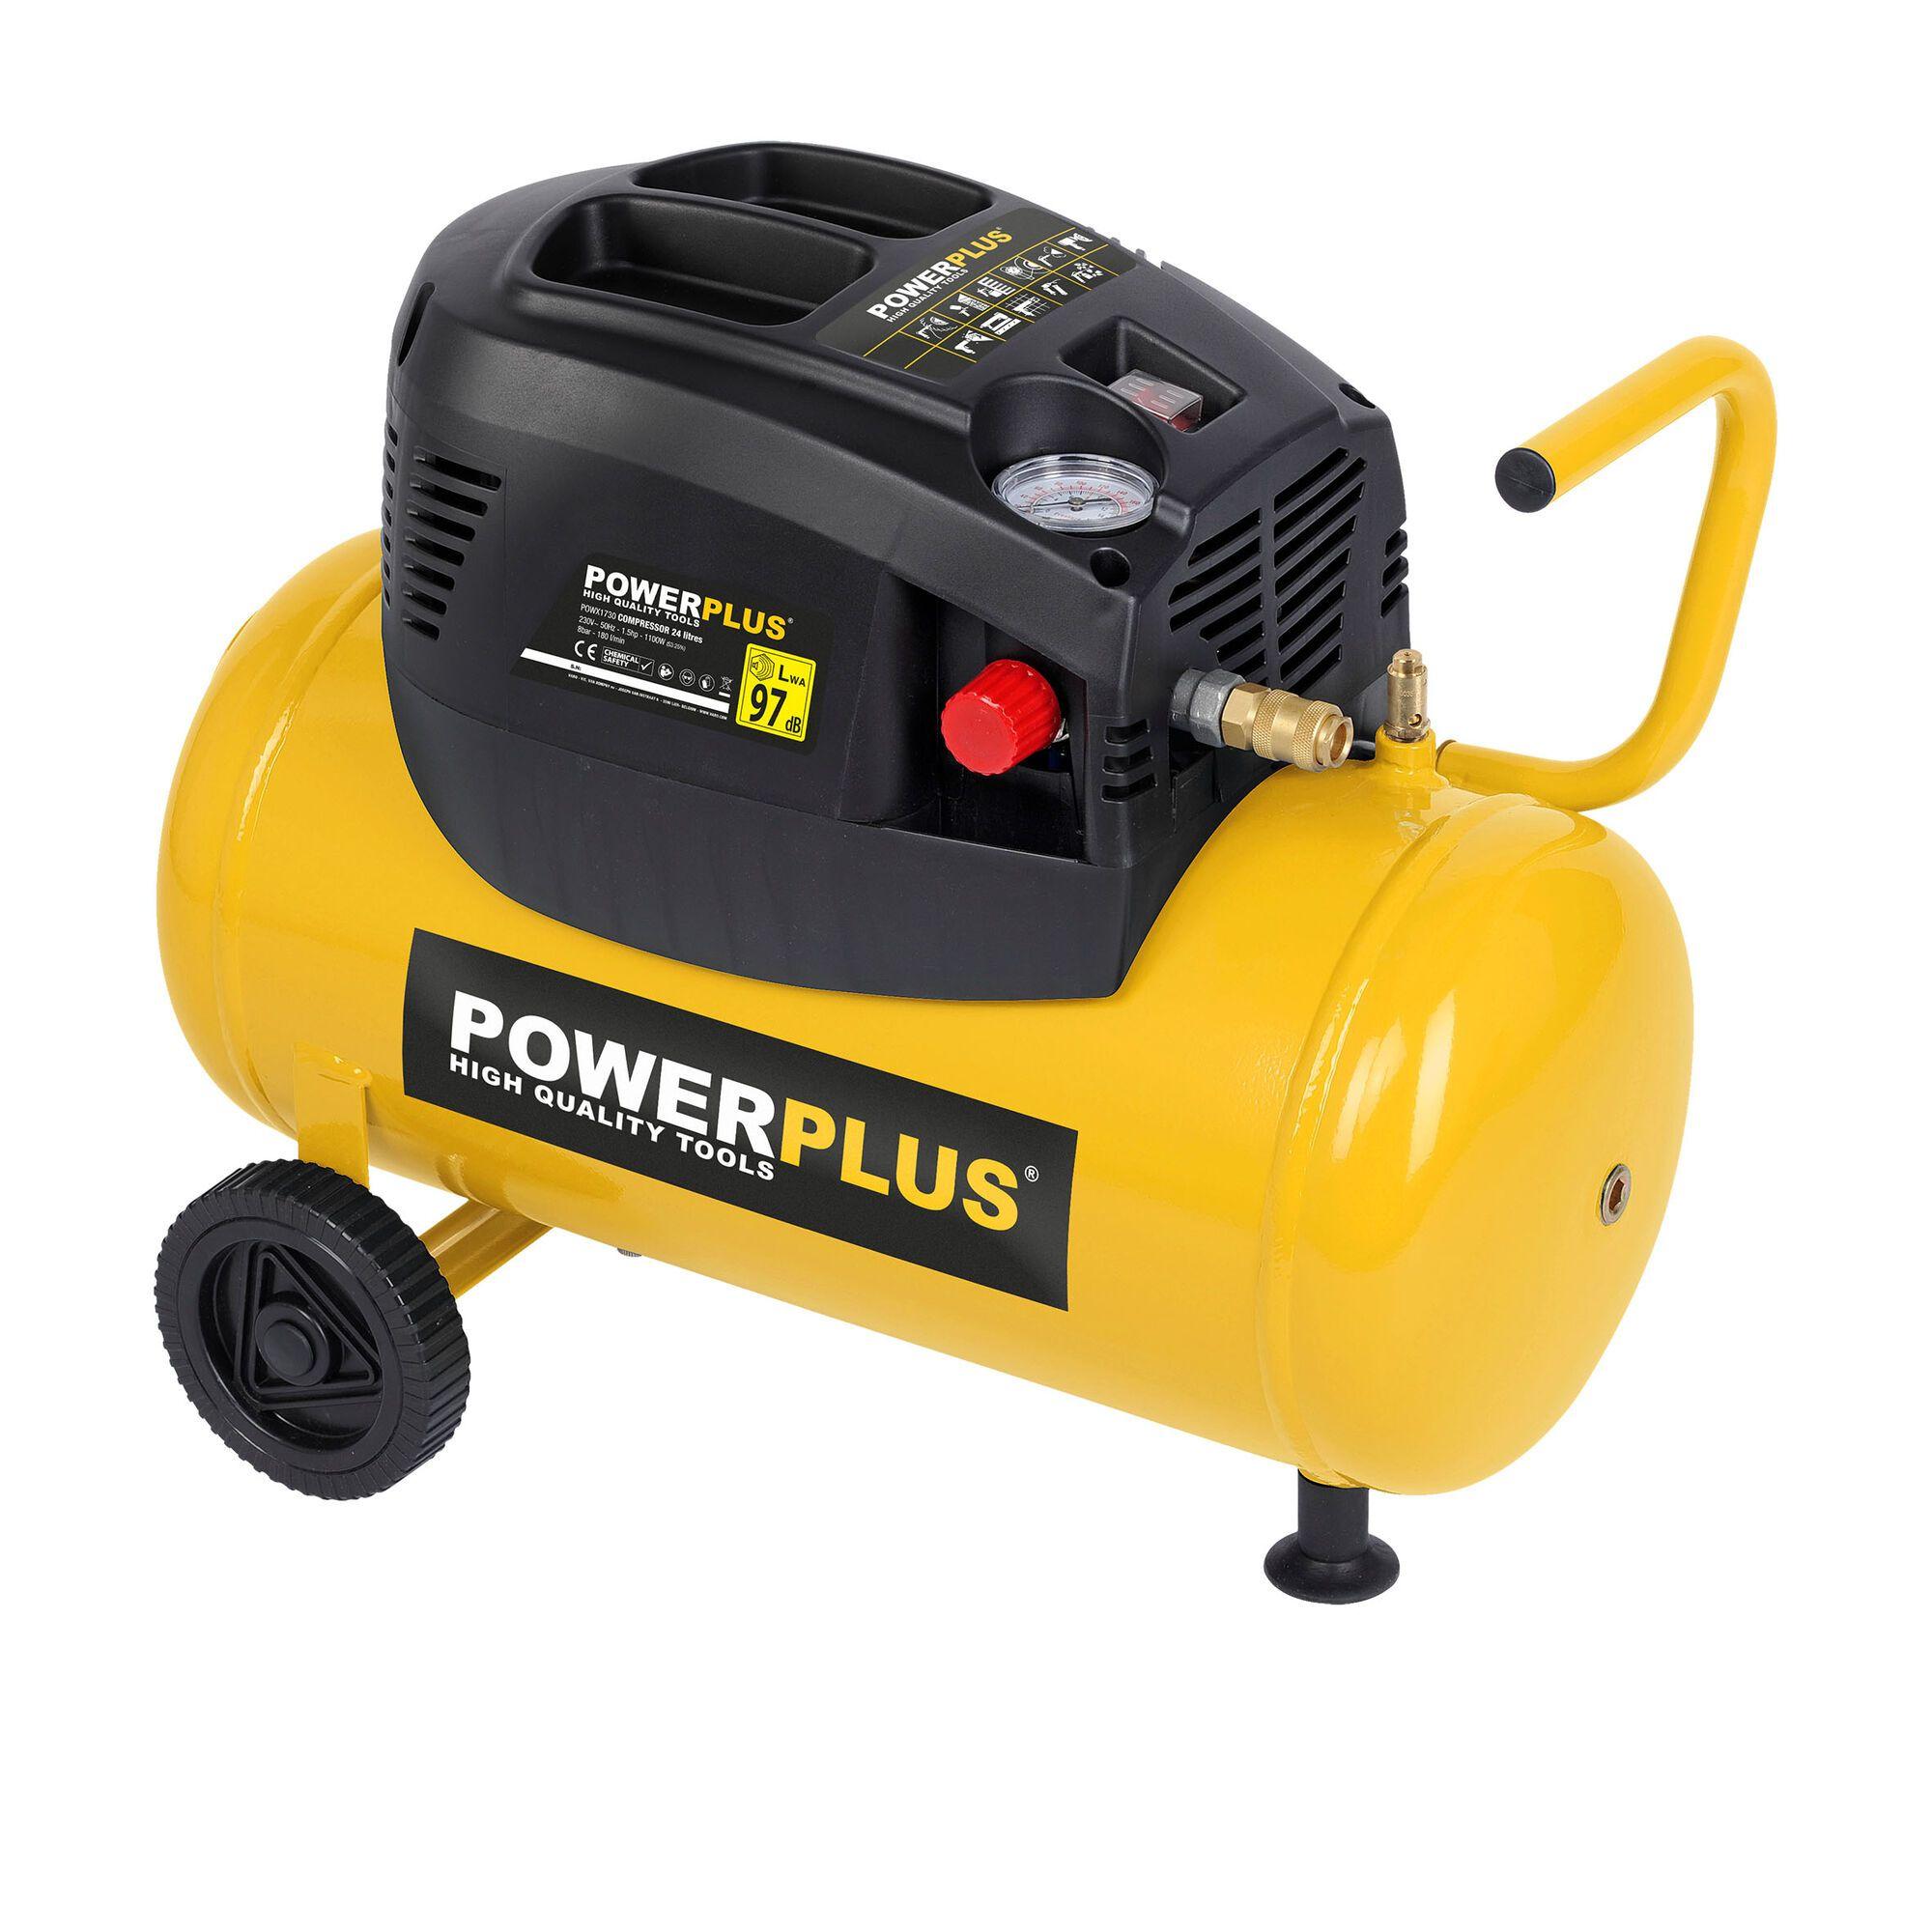 Powerplus POWX1730 Mobiele 1100W olievrije compressor met 24 liter tank (compressoren)